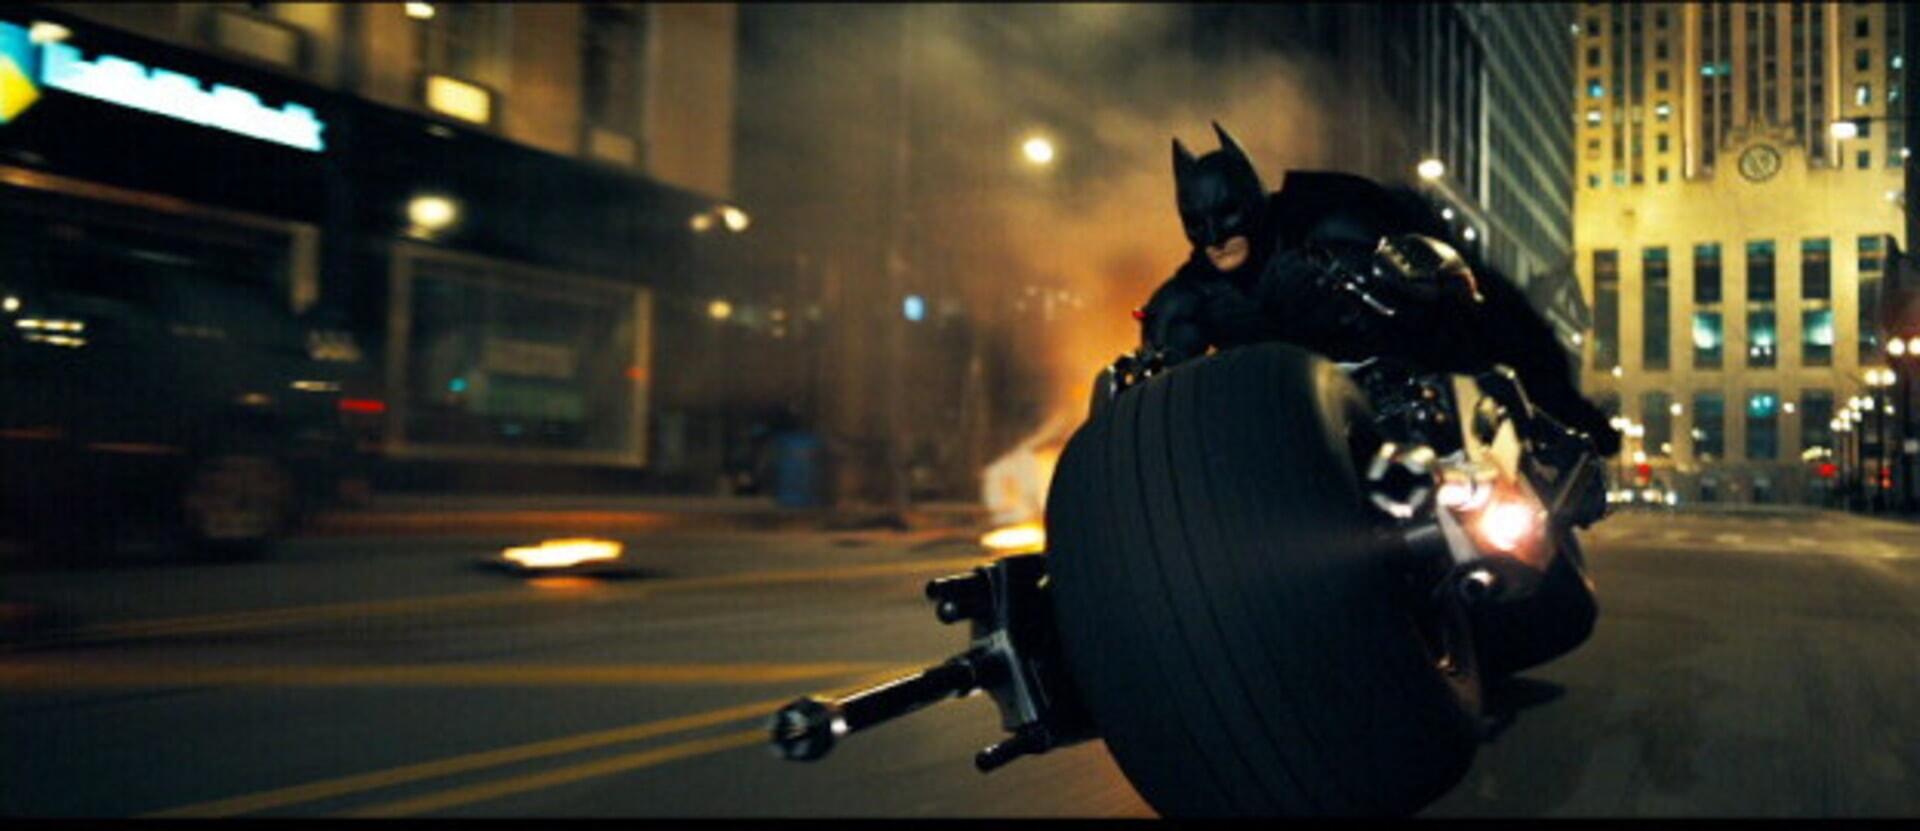 The Dark Knight - Image 11